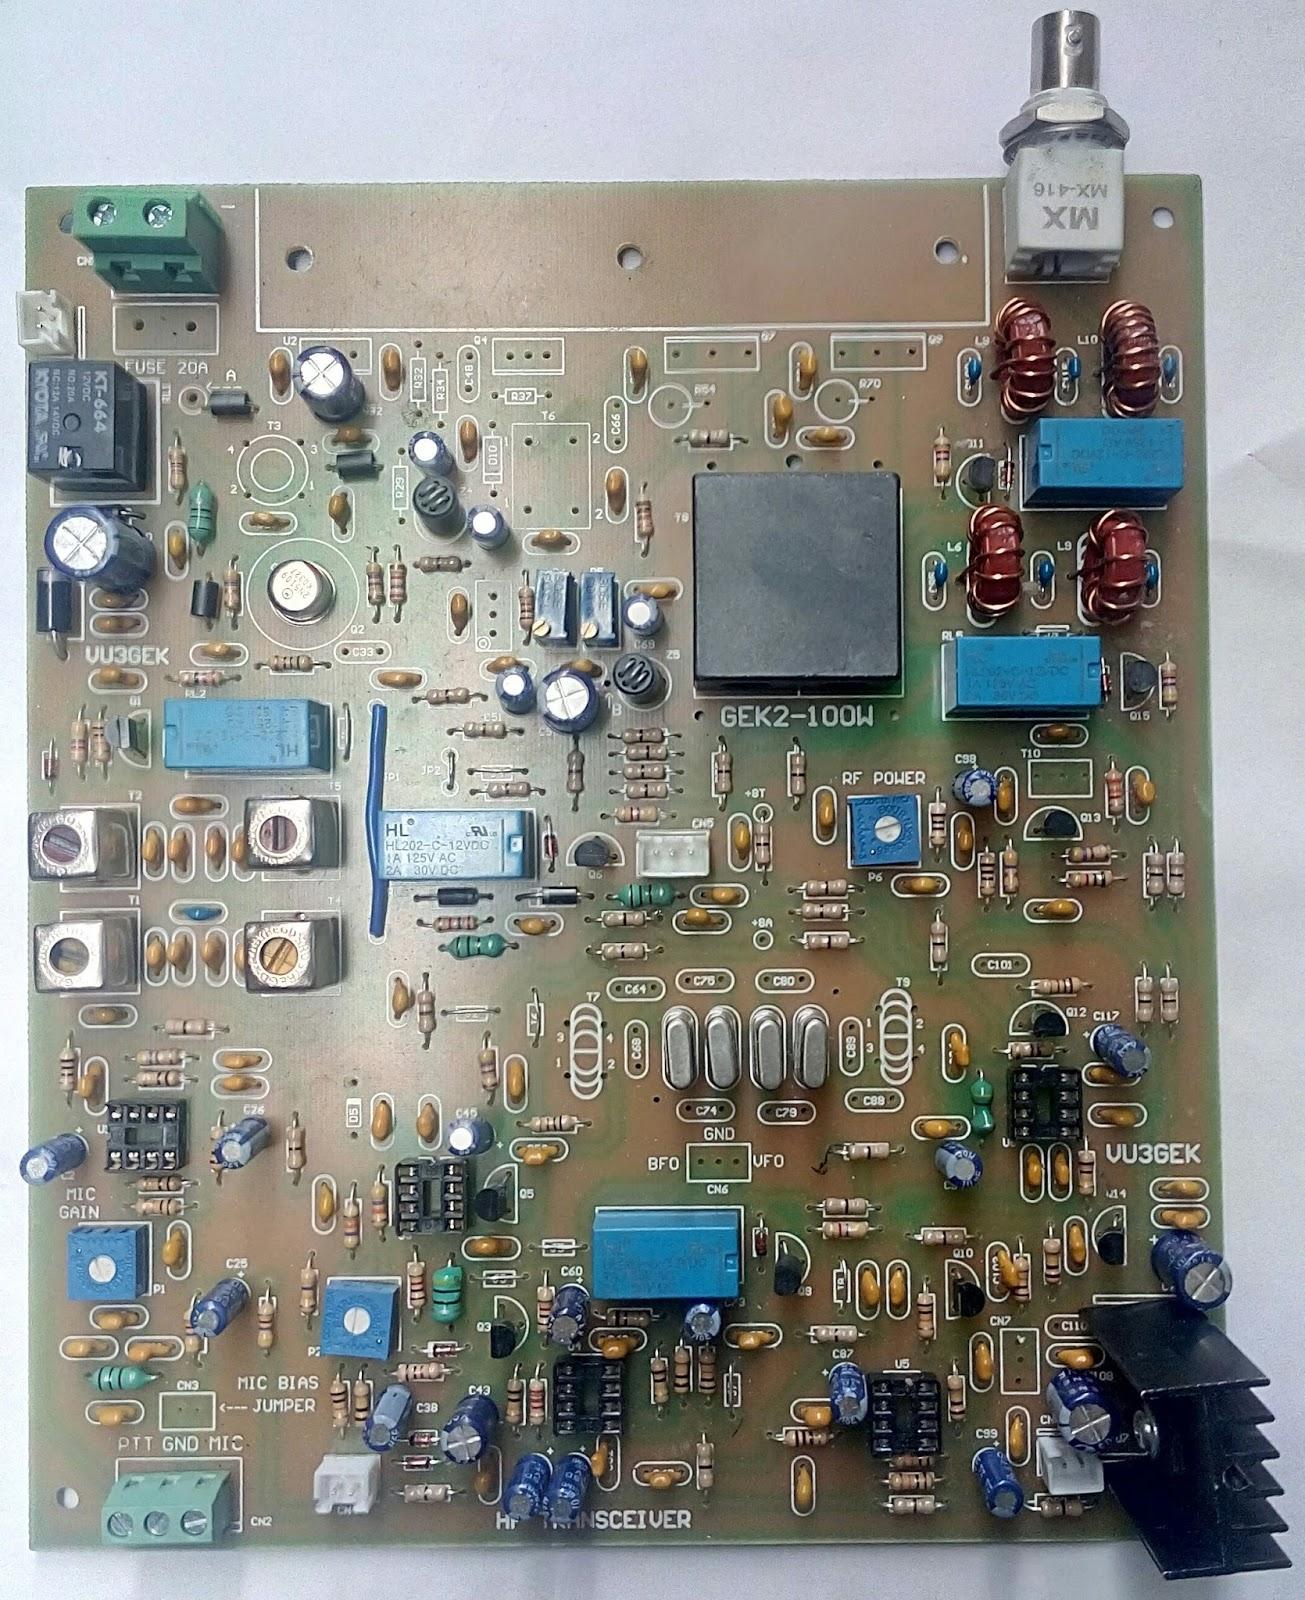 Home Brew Corner: GEK SSB HF Transceiver